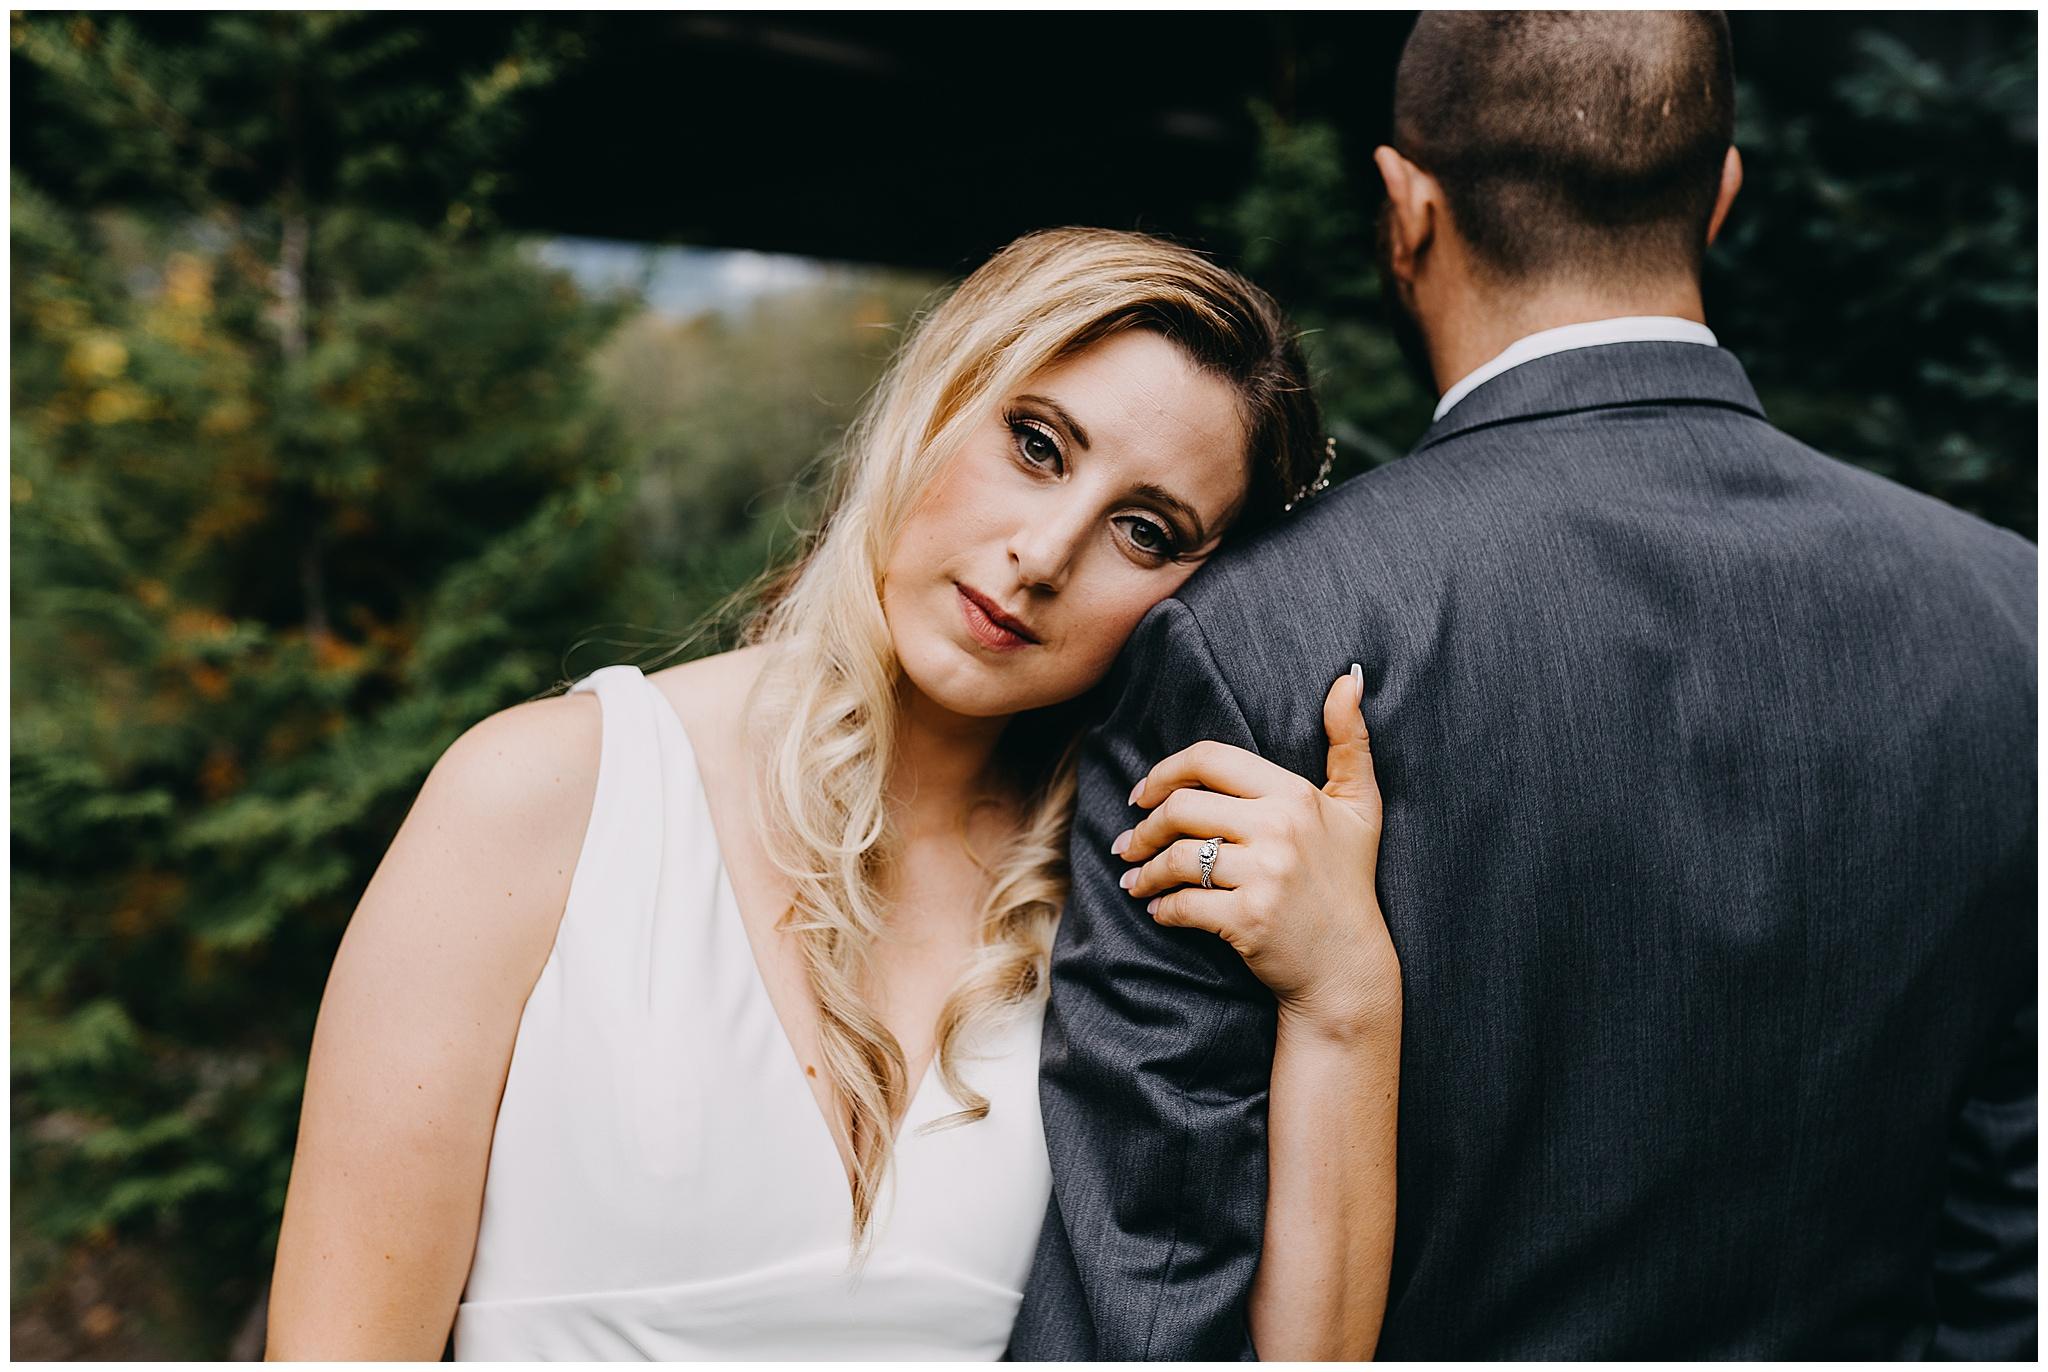 index-wa-wedding27.jpg